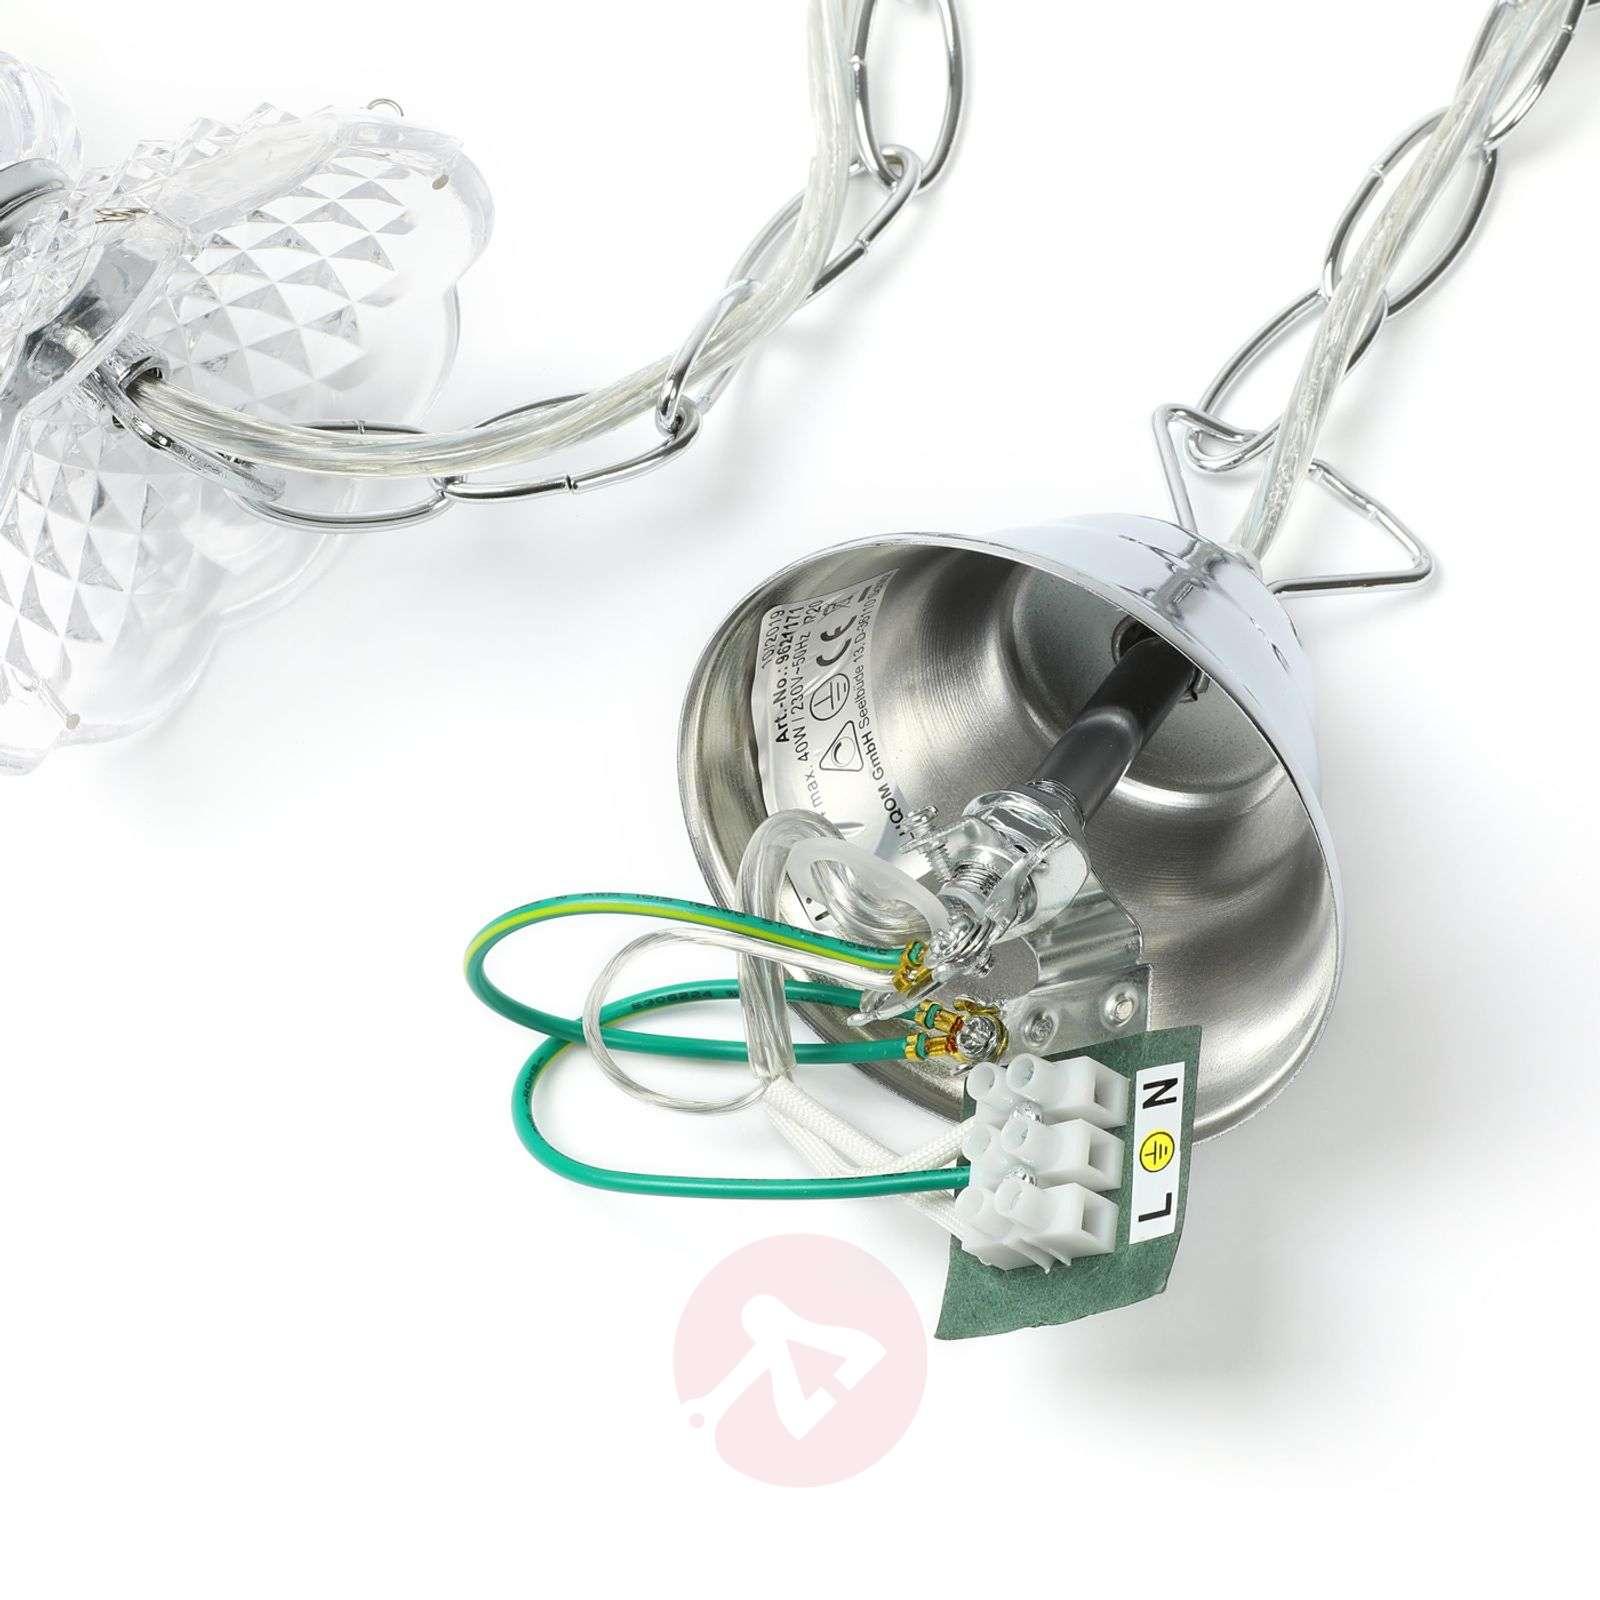 Five-bulb chandelier Merida-9621171-02